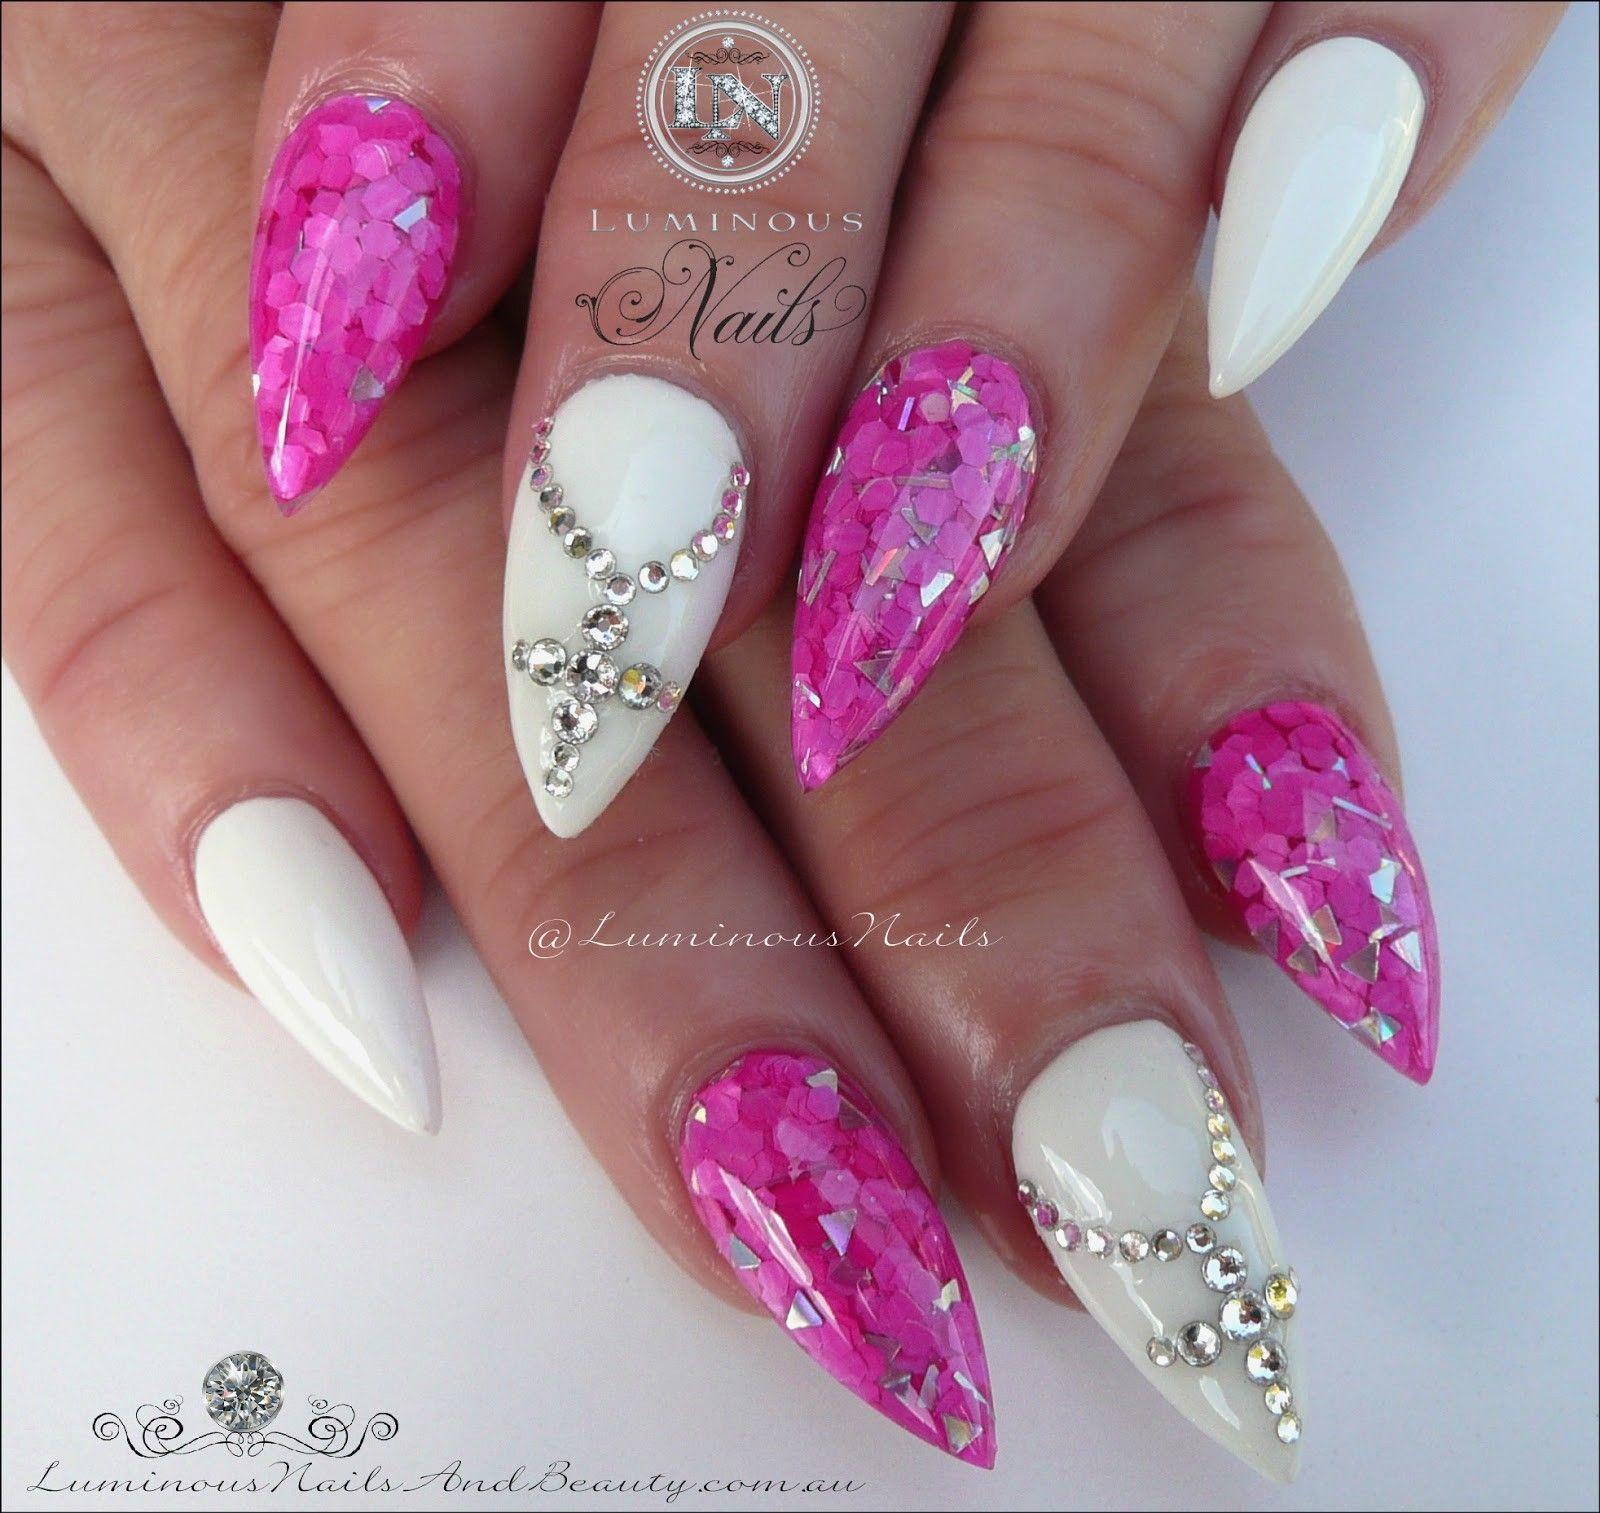 Modele Unghii 2019 13 Modele Unghii In 2019 Luminous Nails